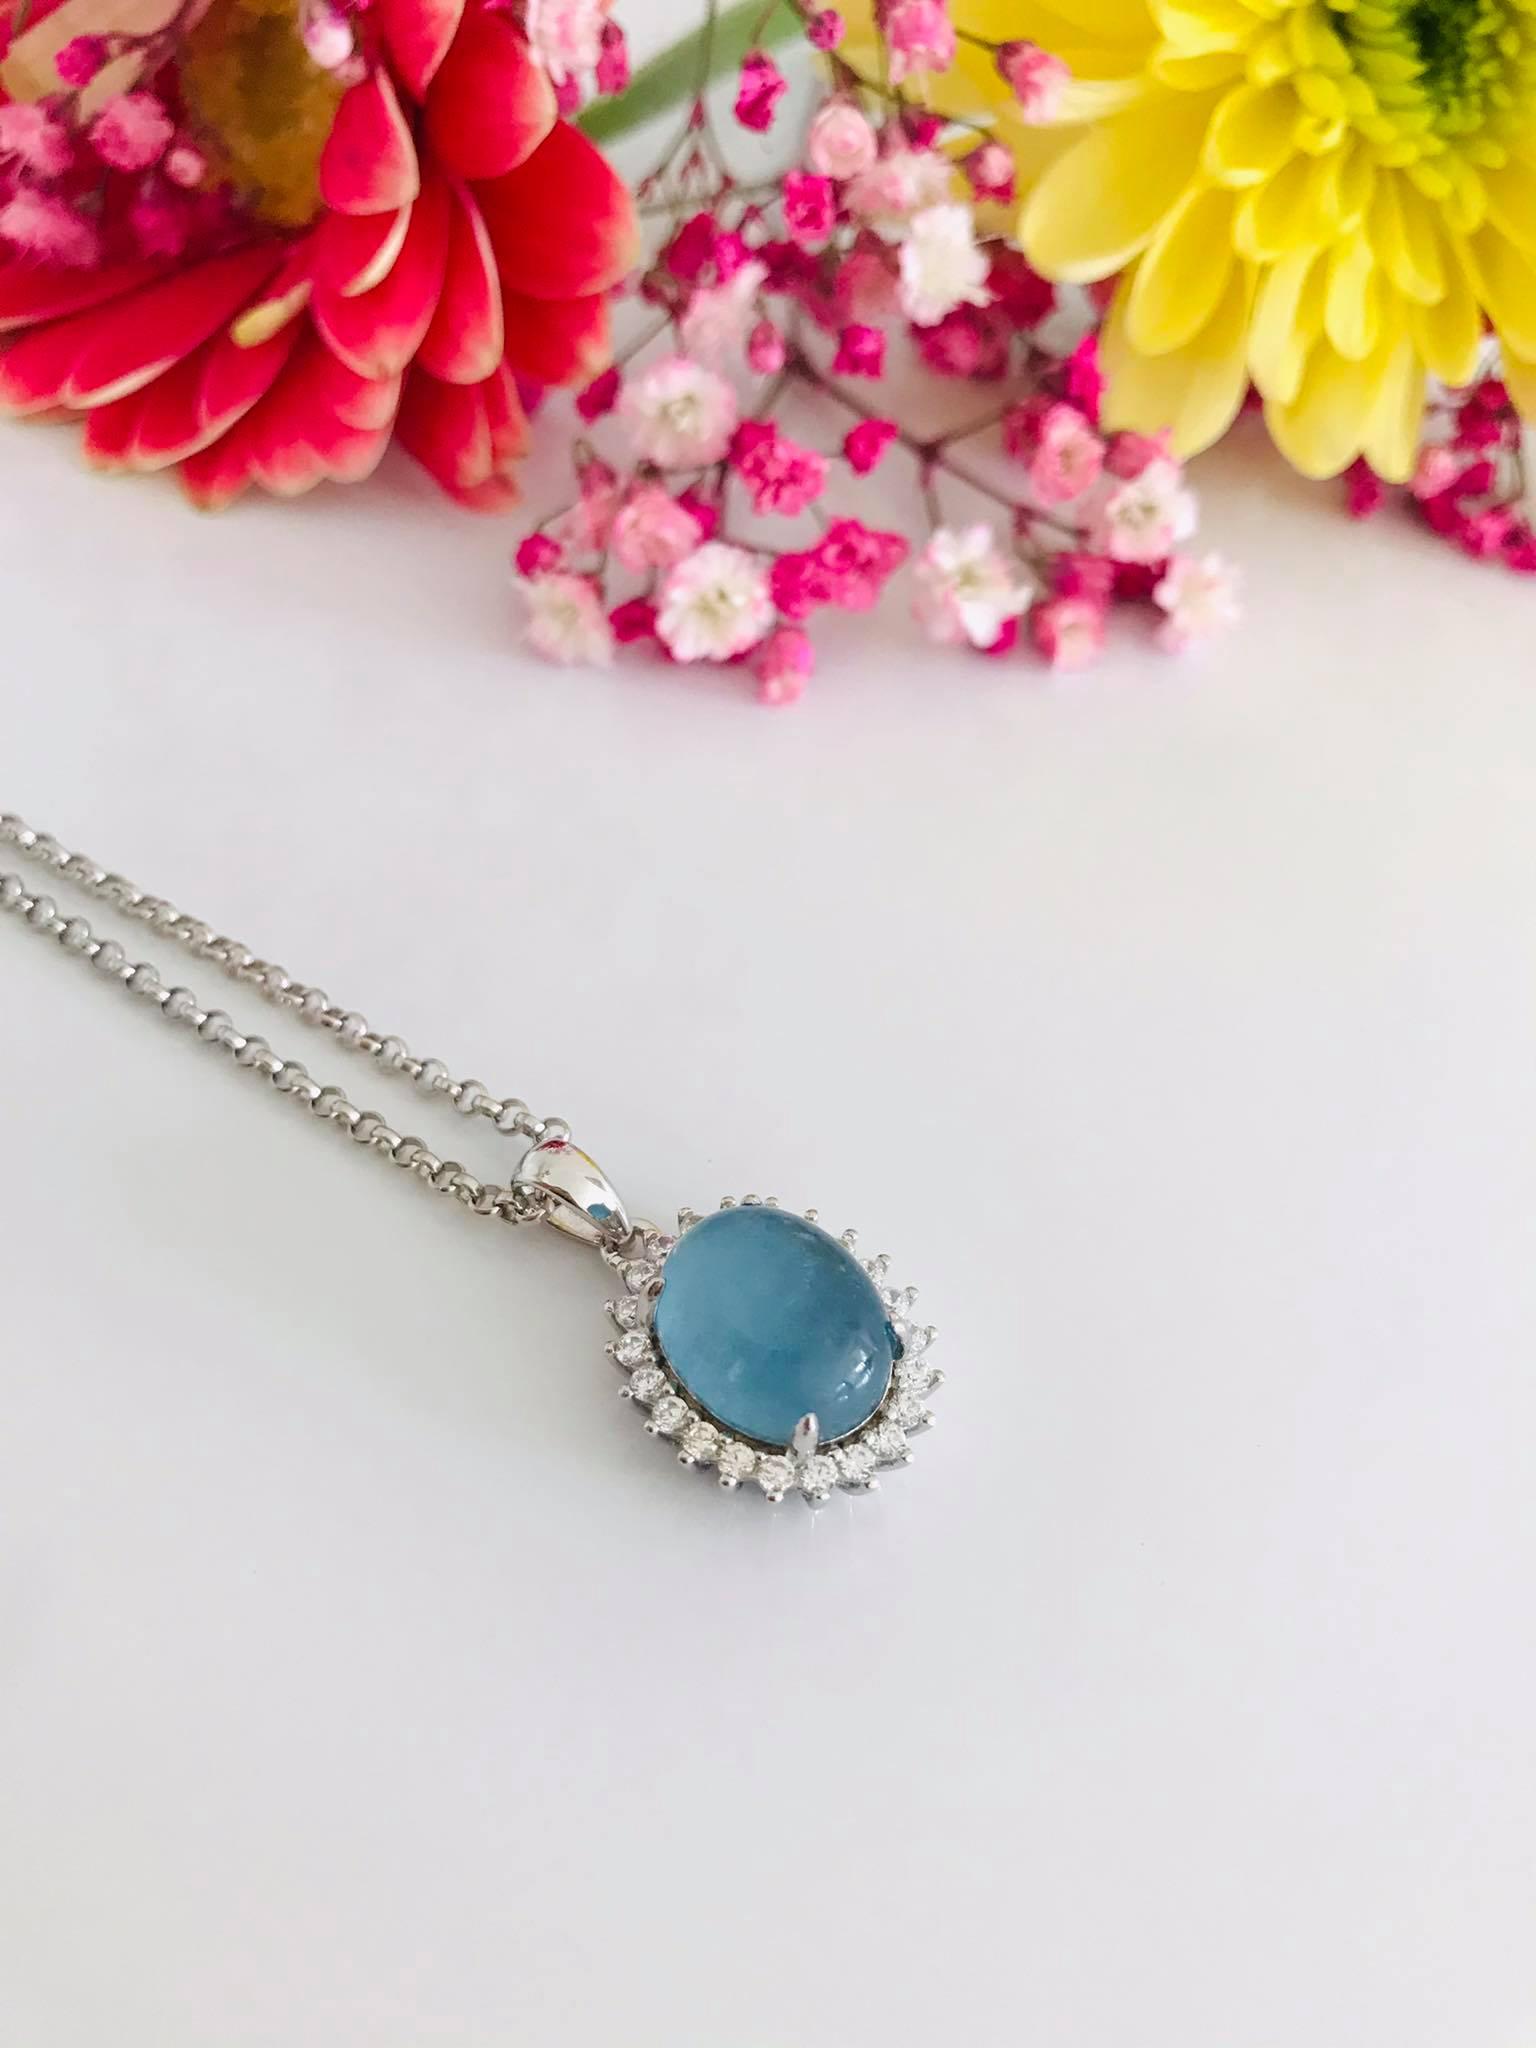 Aquamarine set in Silver Necklace Image